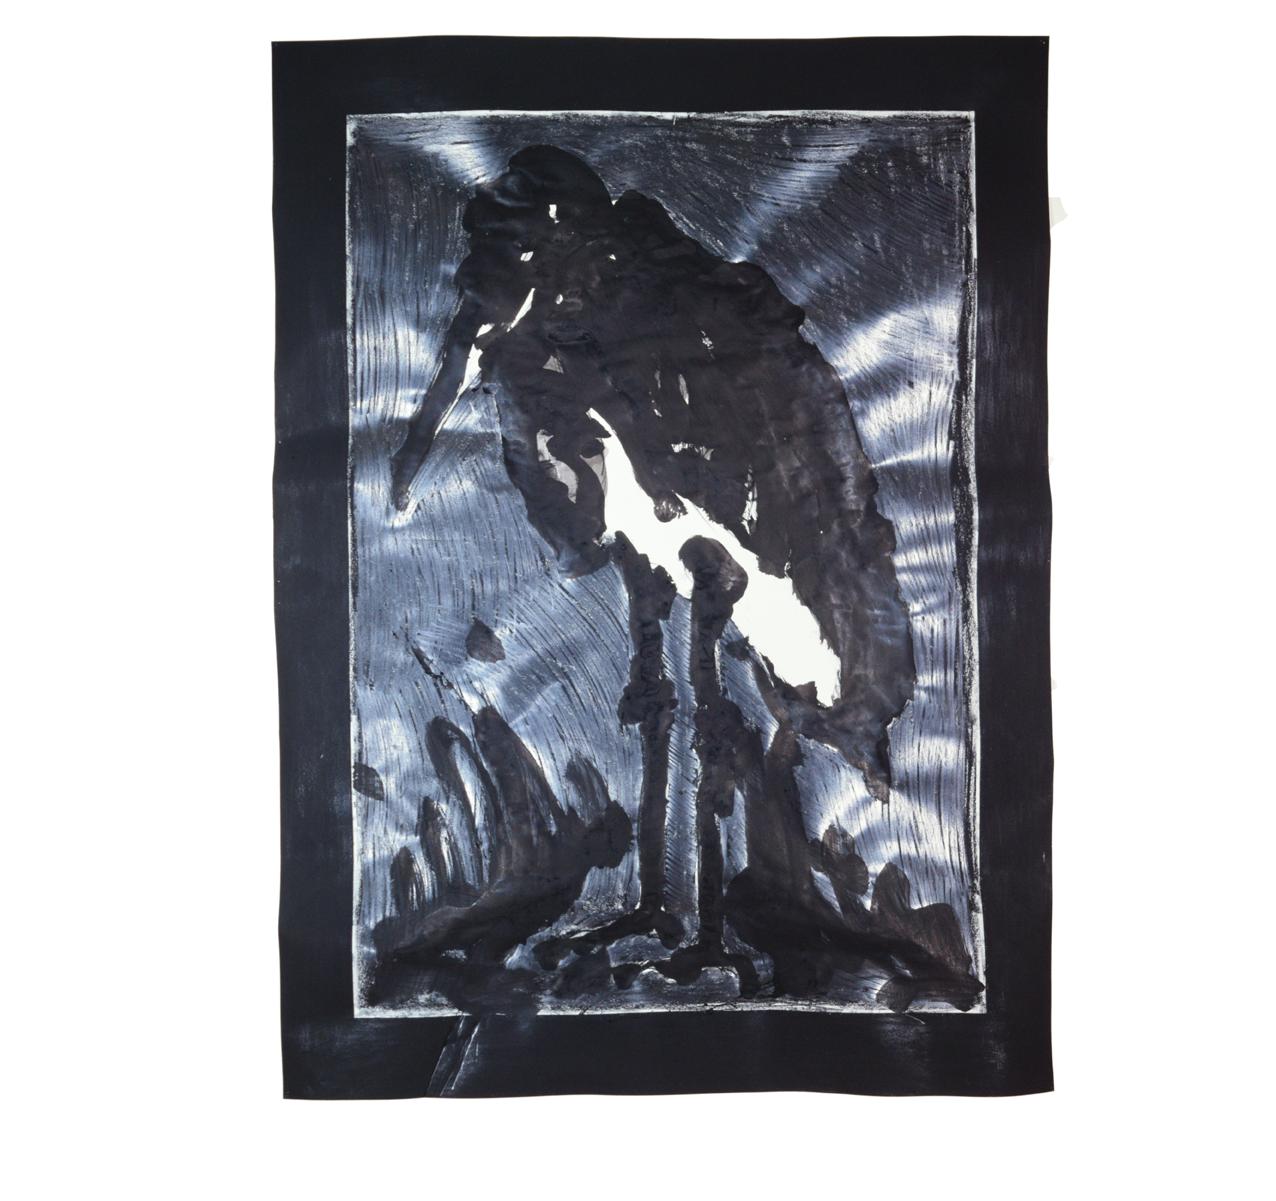 """Marabu"" 1981, Kohle, Graphit, Tusche auf Papier, 157 x 115 cm - Foto Hadler/Stuhr"